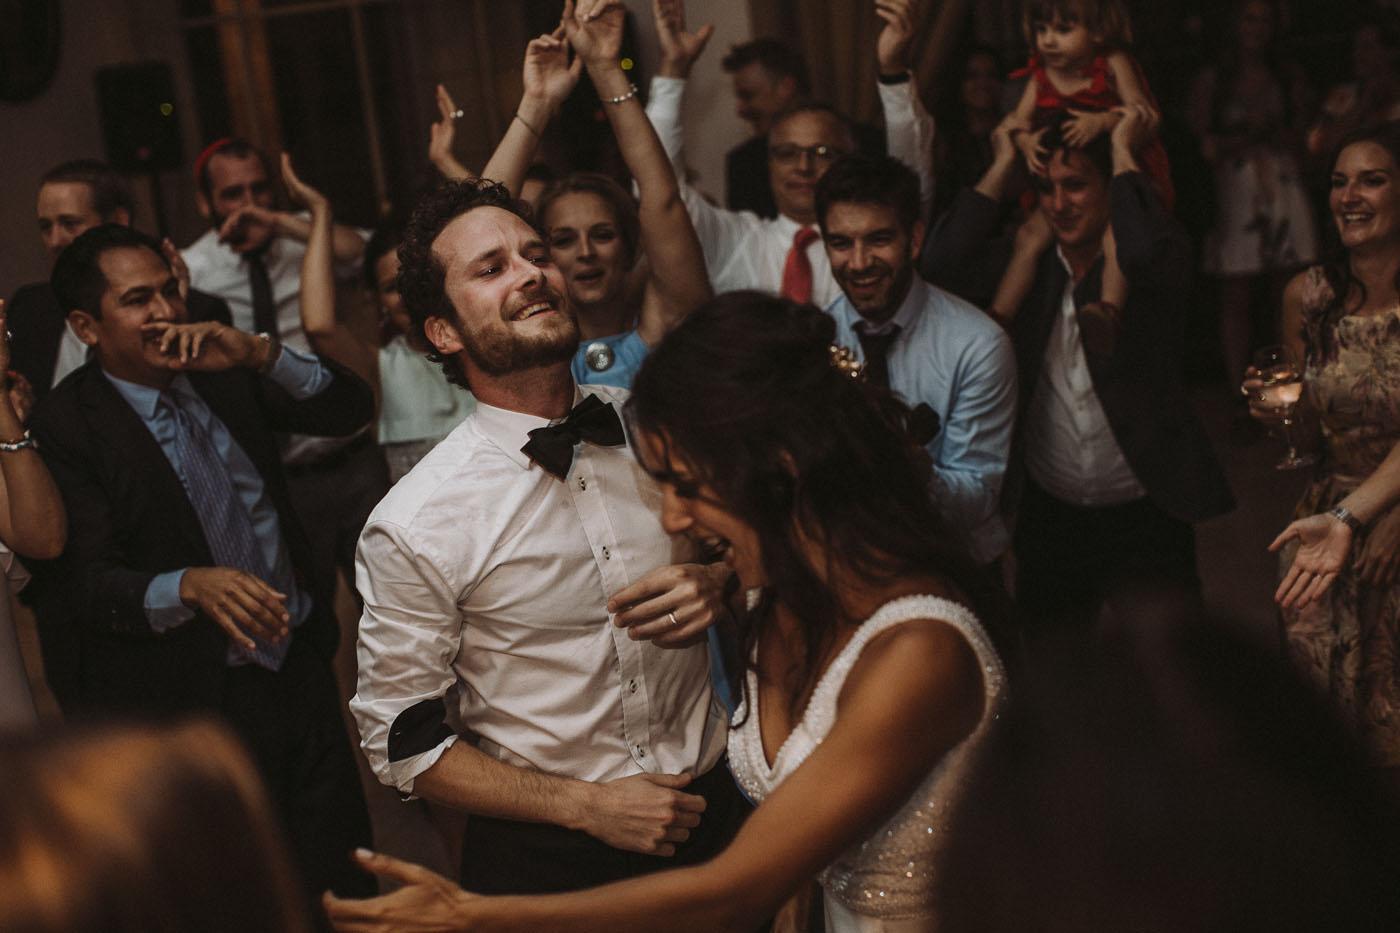 wedding-leopoldskron-photographer-92